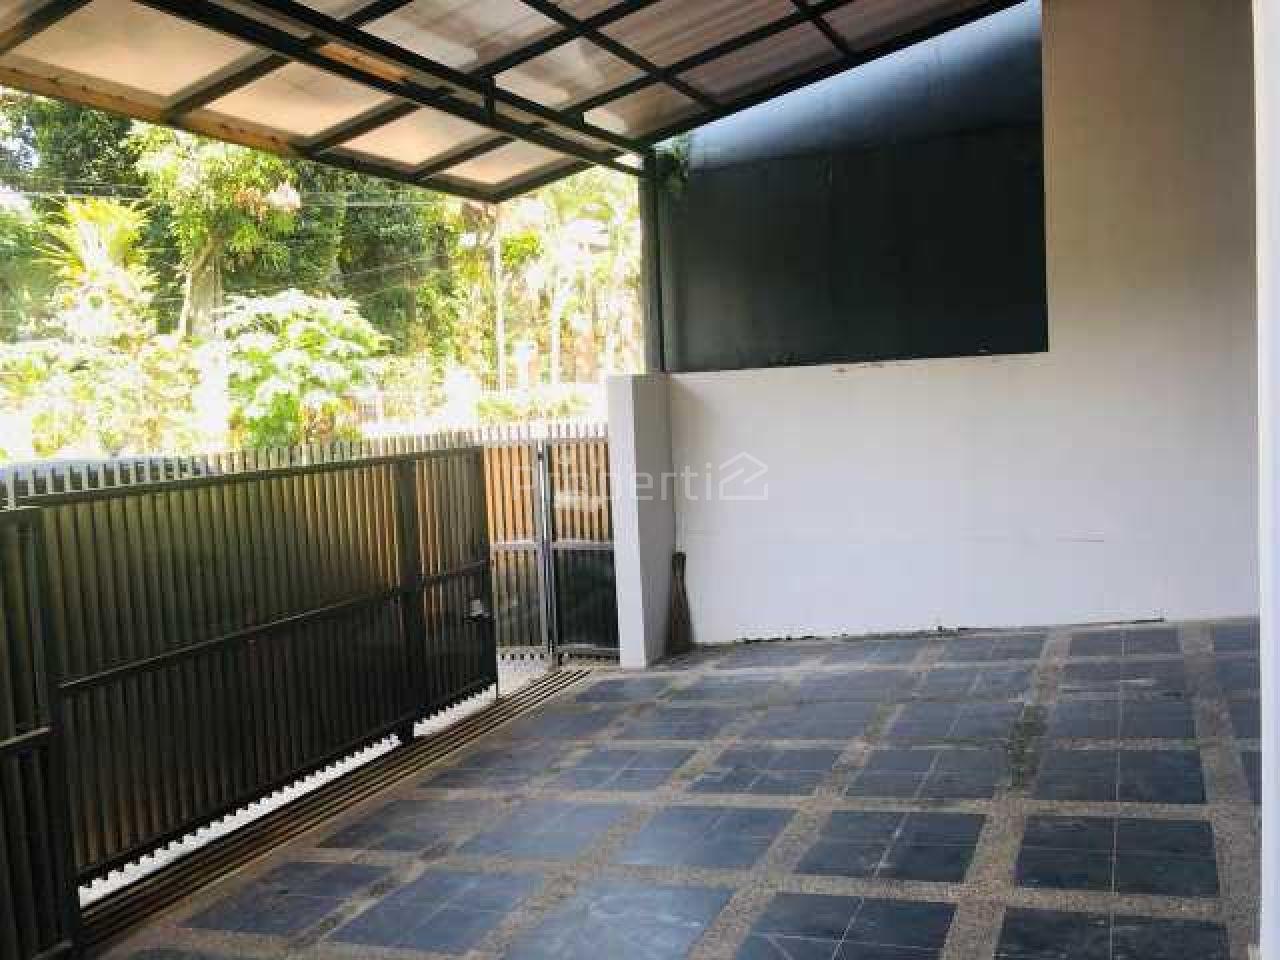 Rumah Baru di Setra Murni, Kota Bandung, Jawa Barat